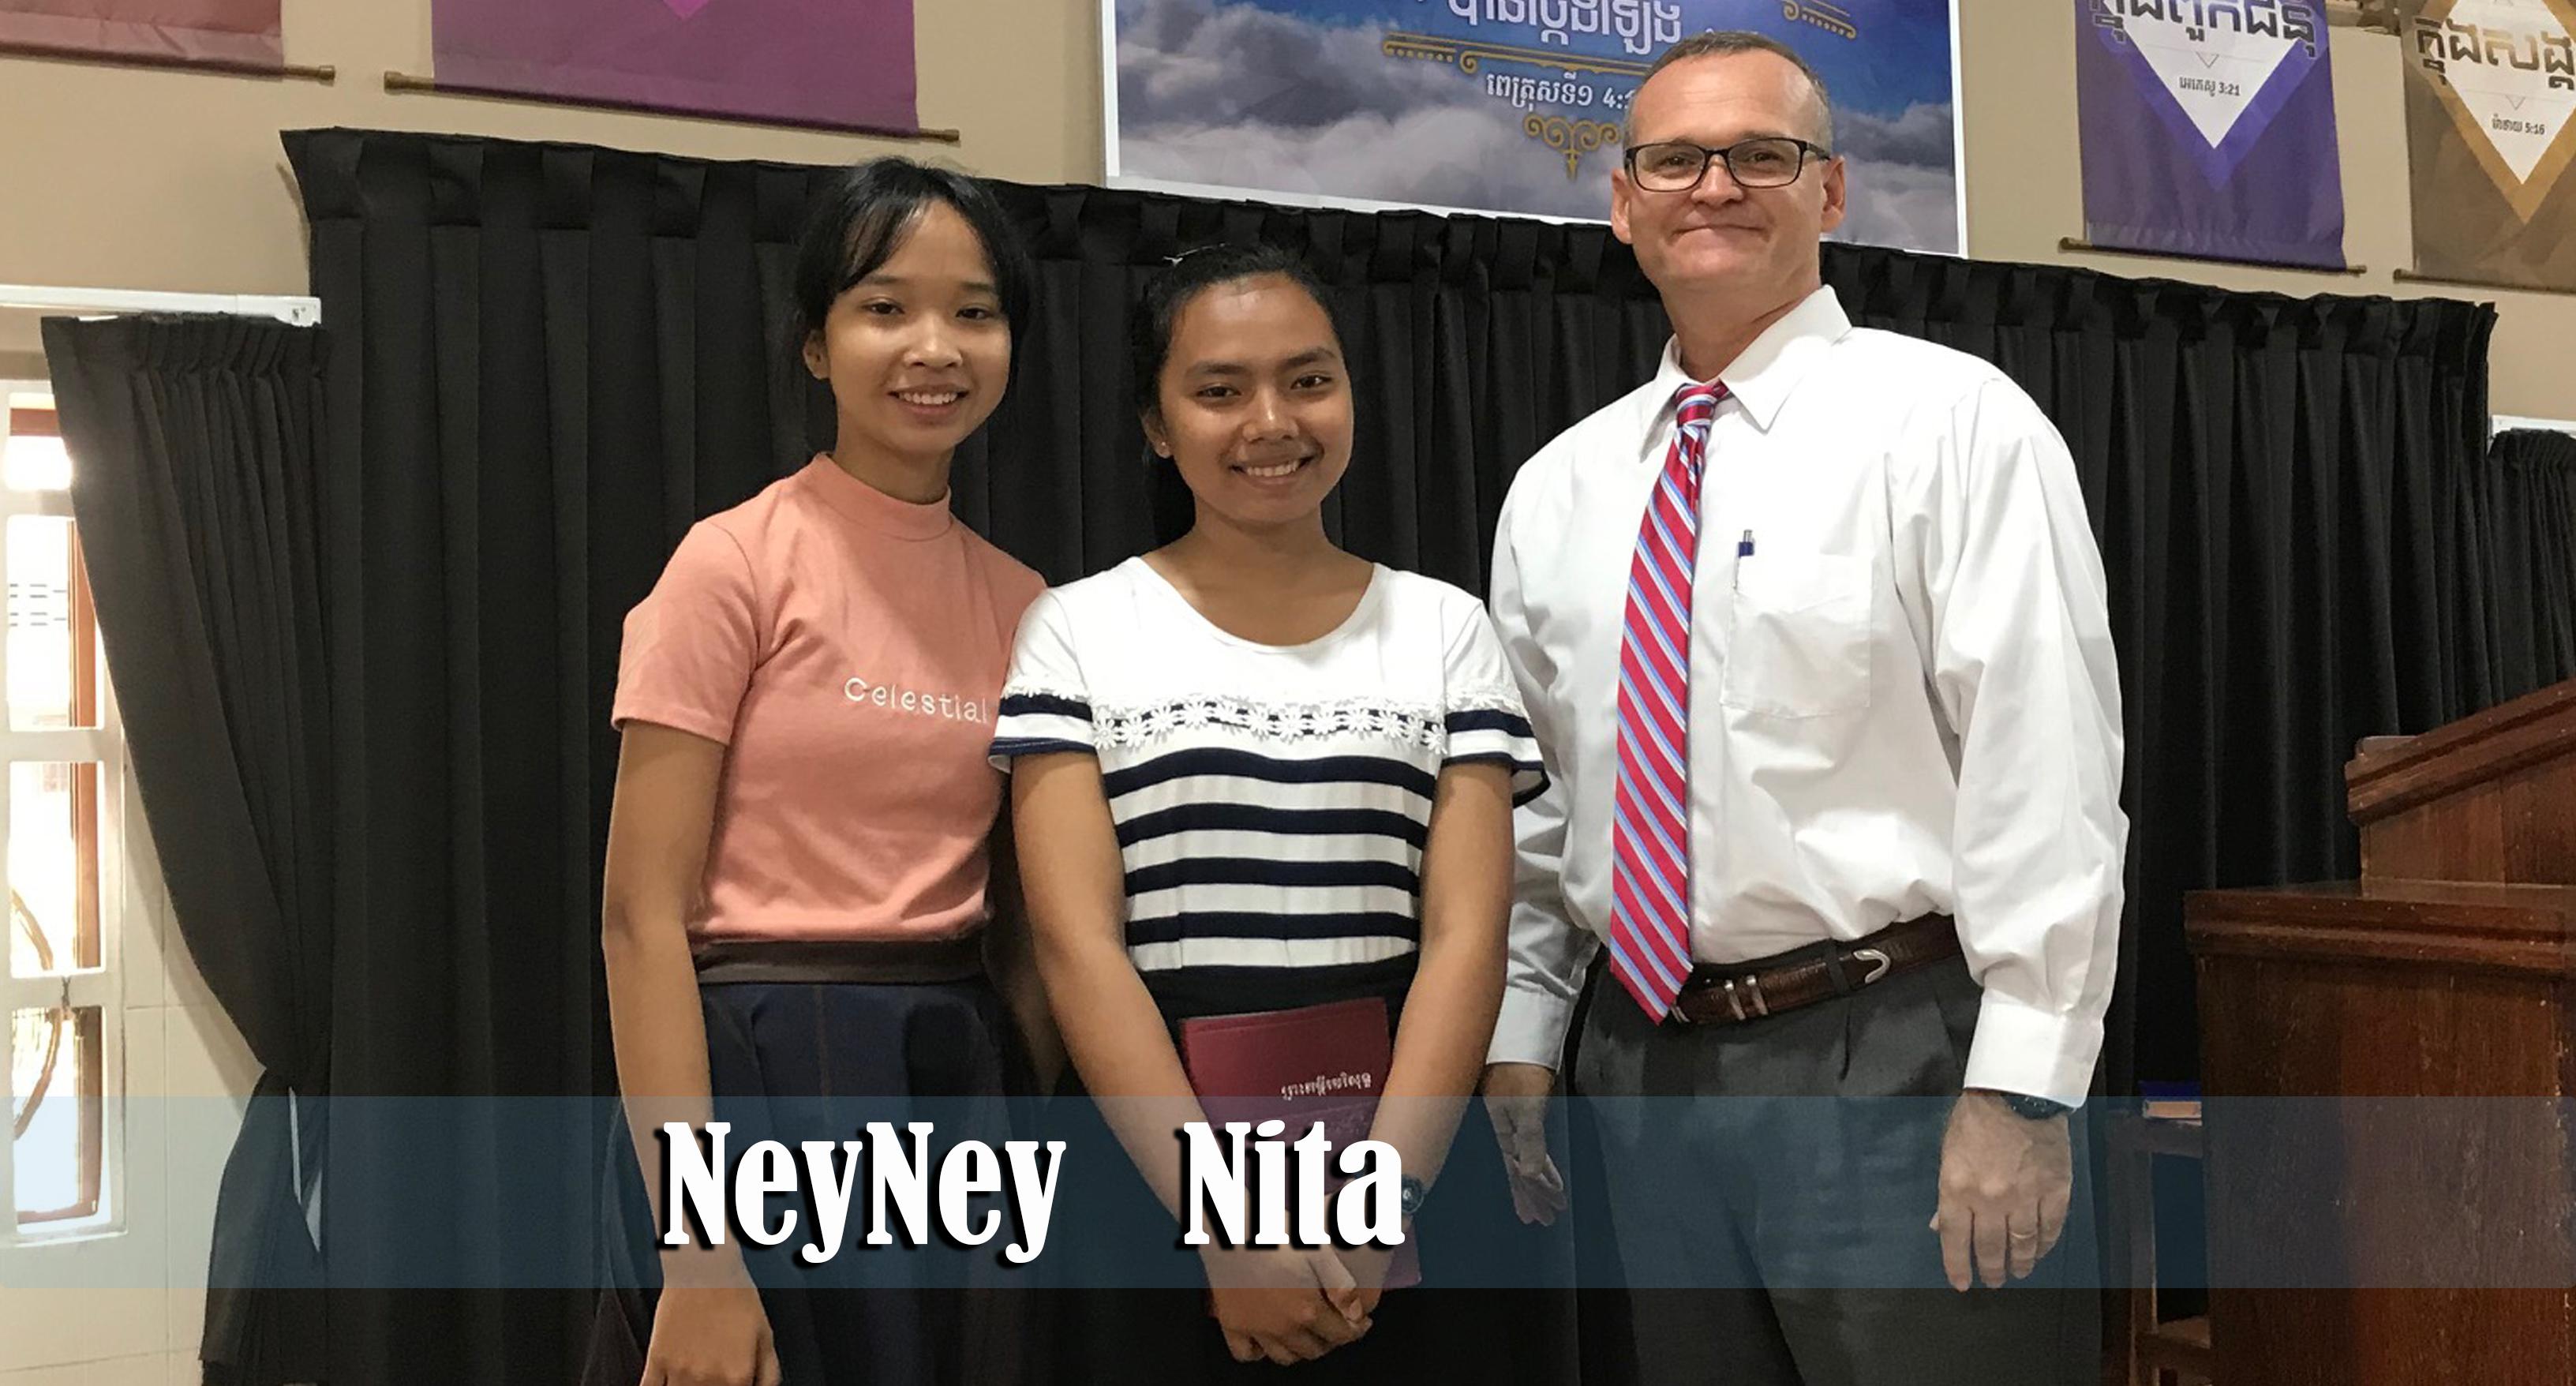 7.15.18 NeyNey and Nita